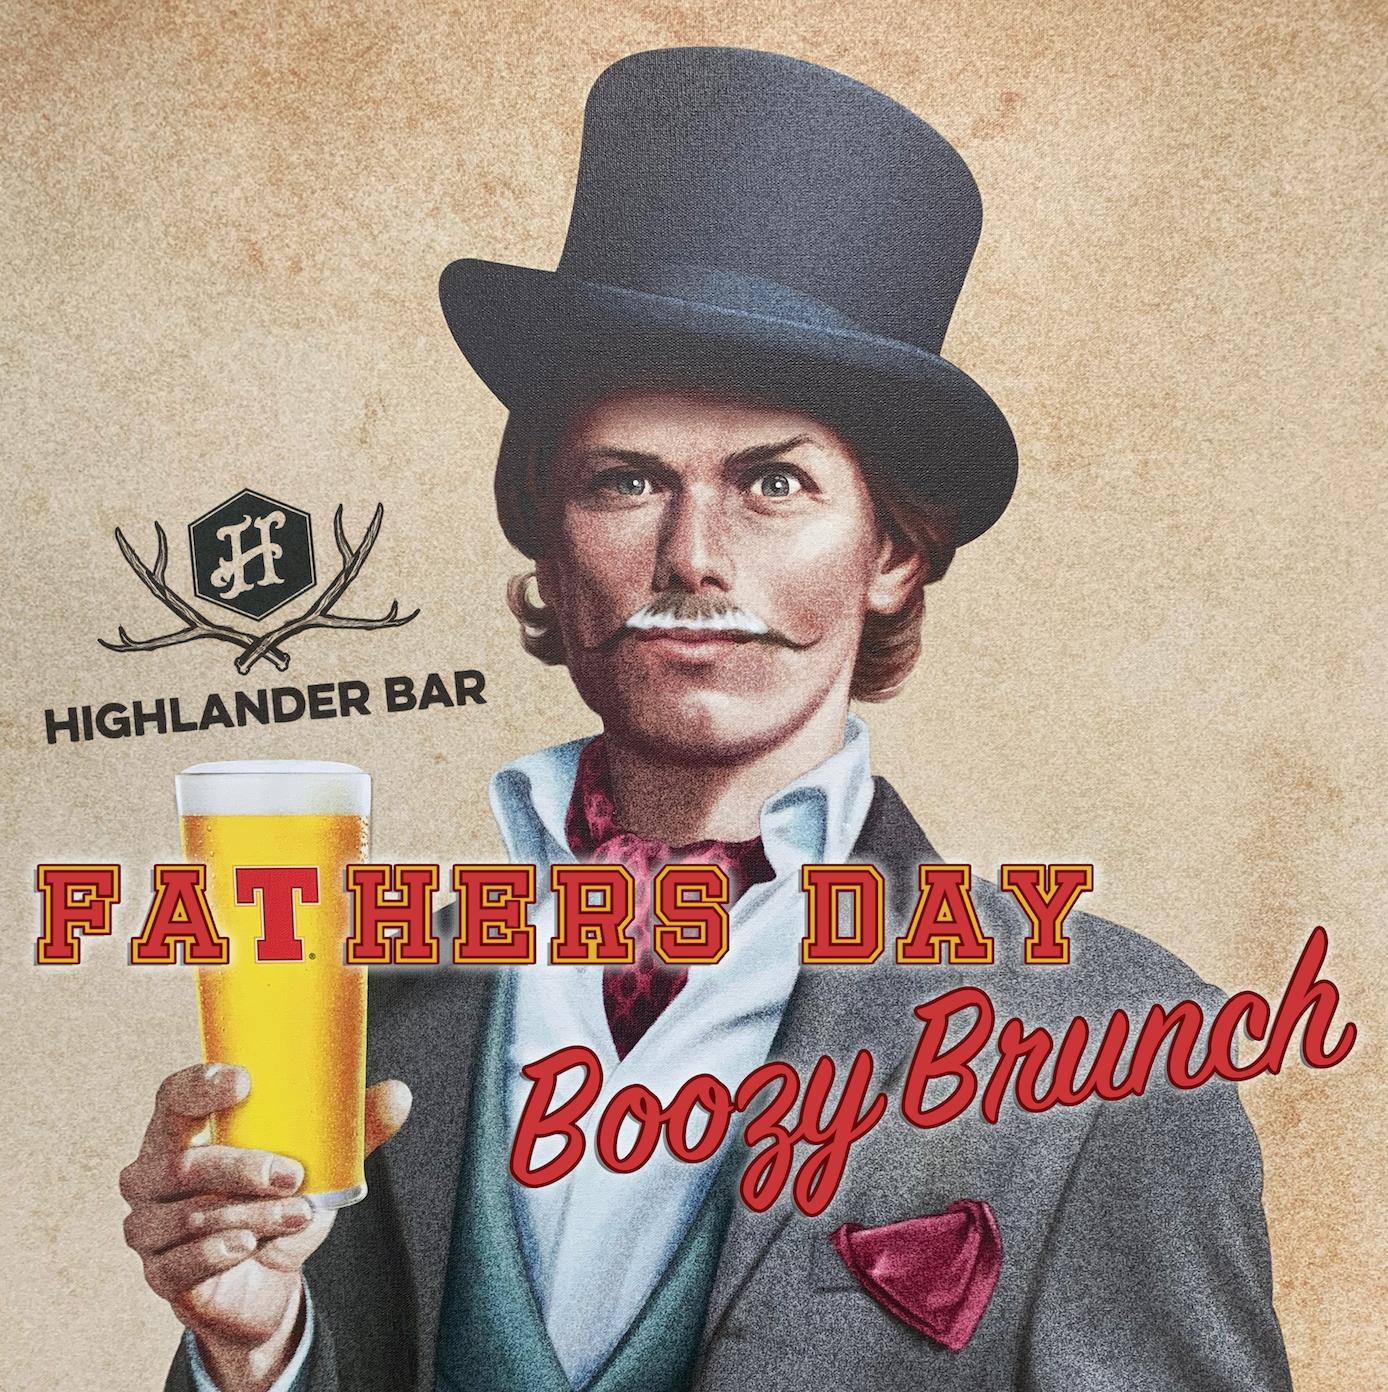 Fathers Day Boozy Brunch